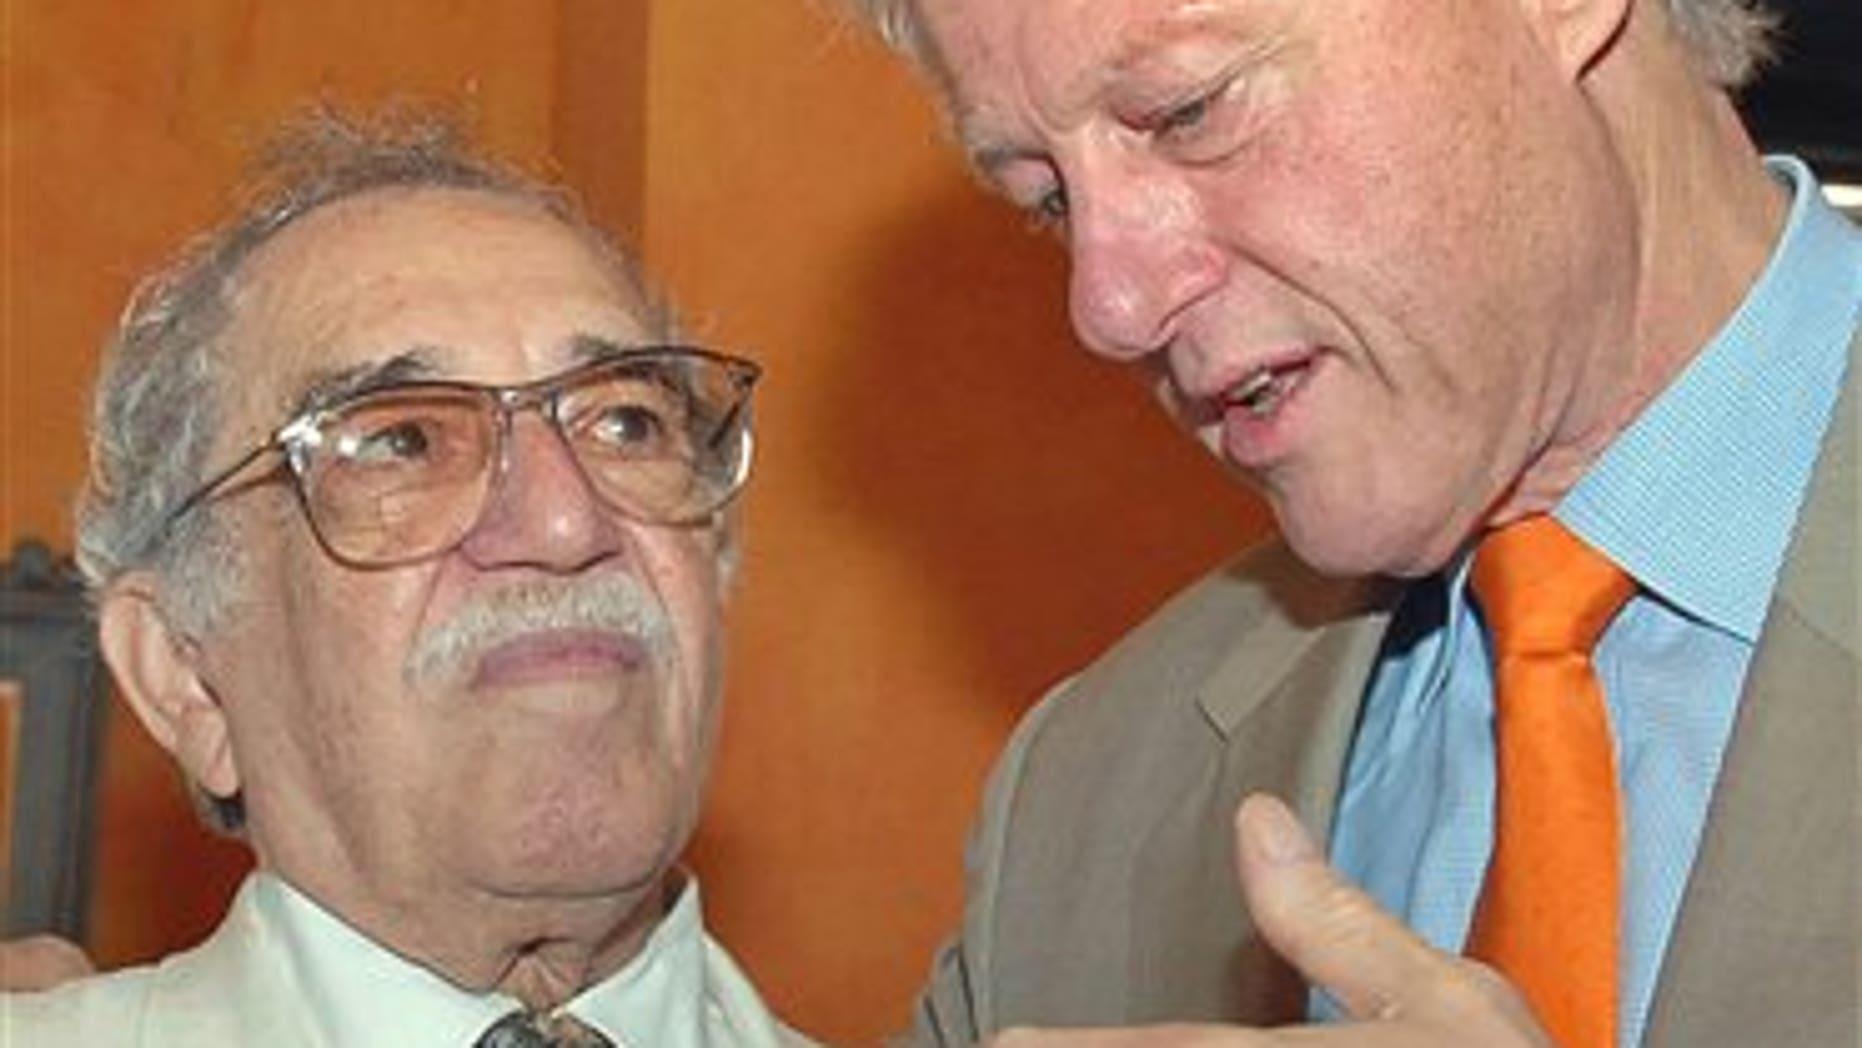 President Clinton and García Márquez in a March 26, 2007 file photo.